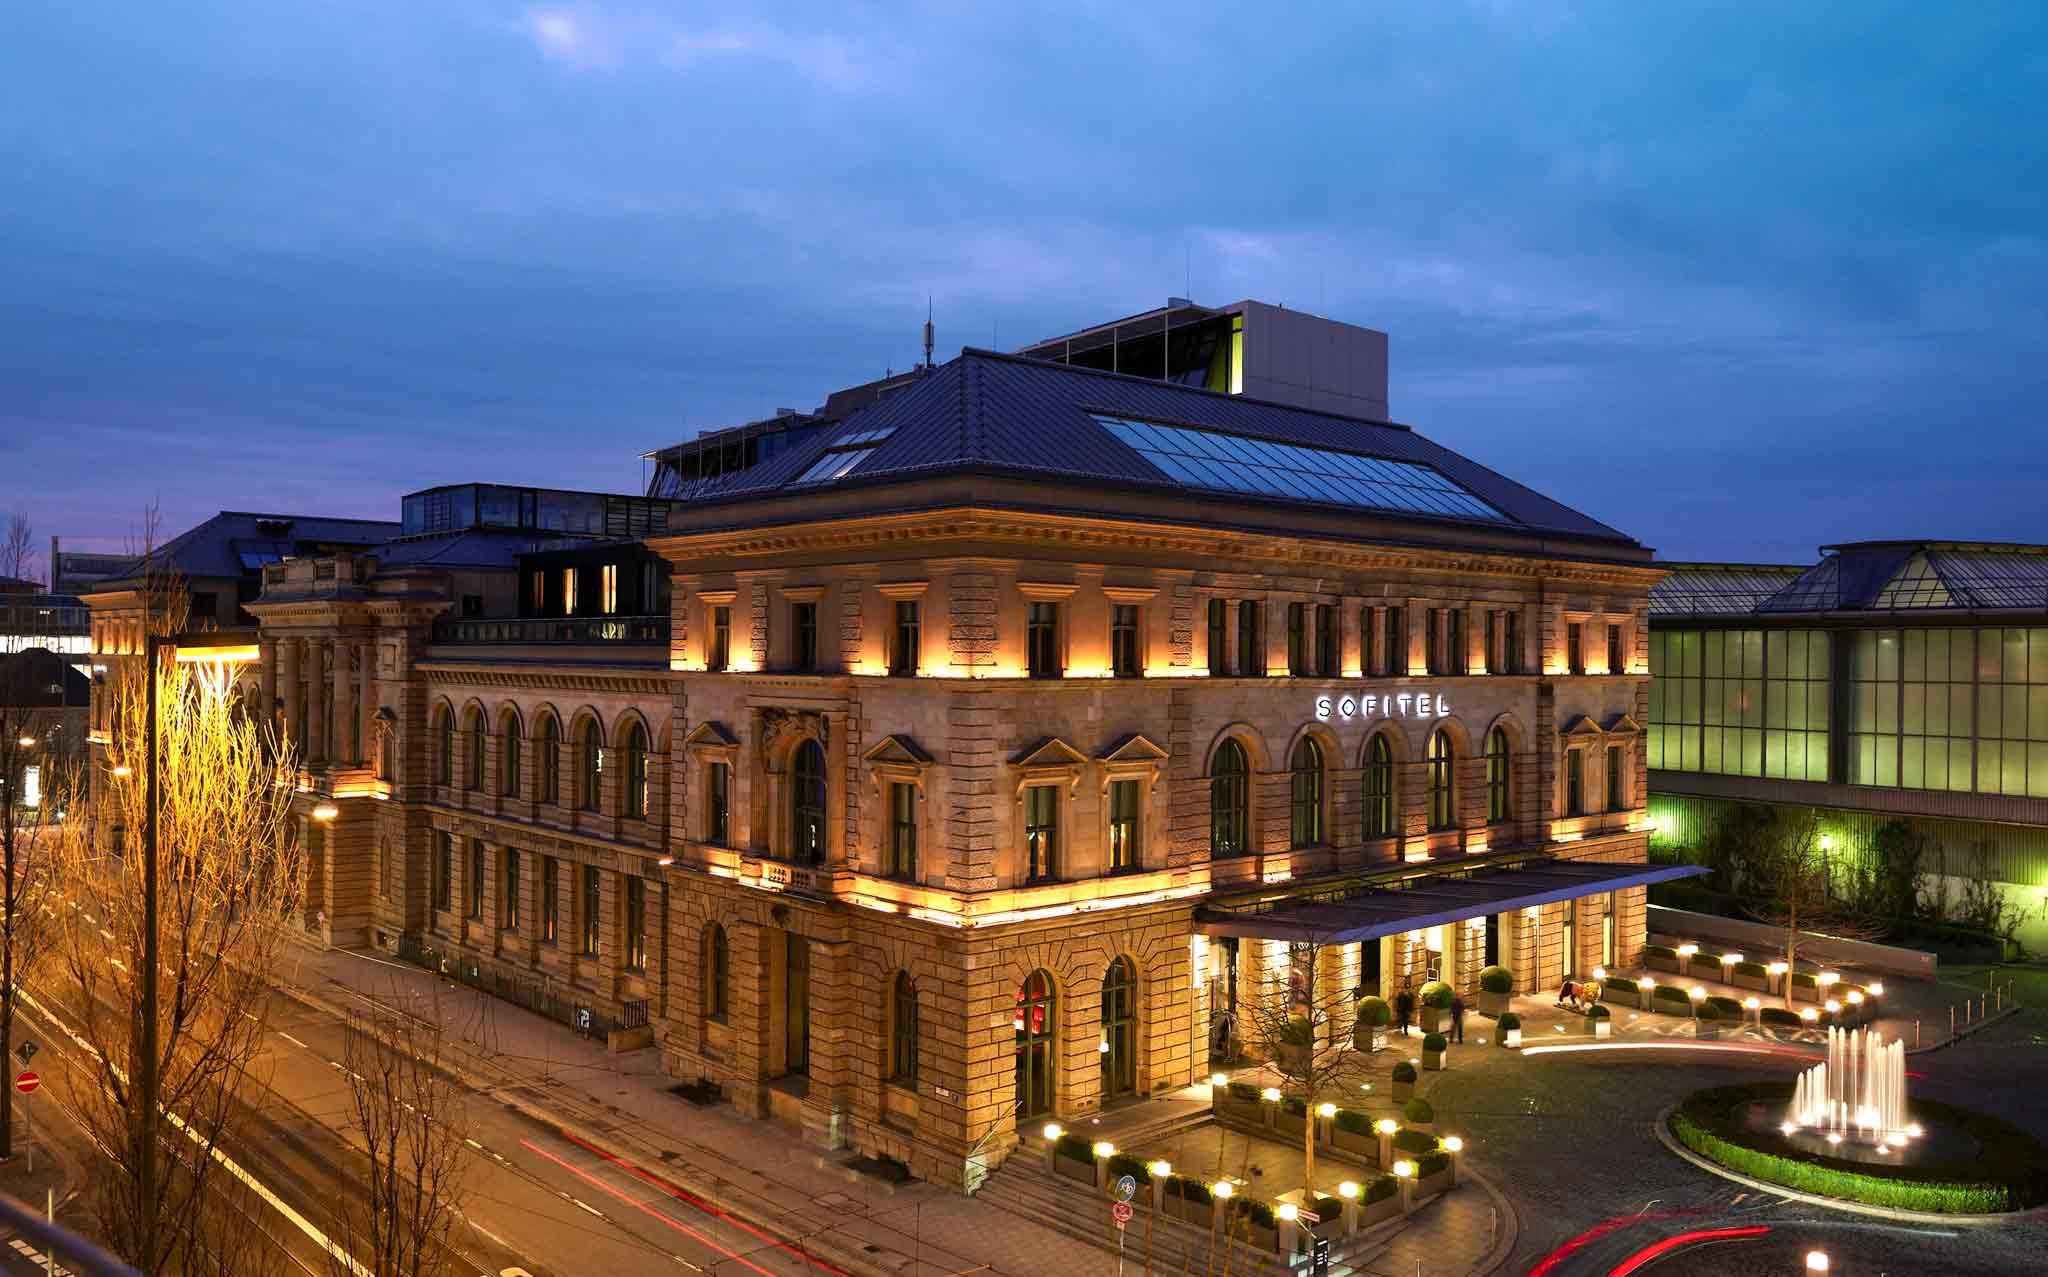 Hotel – Sofitel Munique Bayerpost